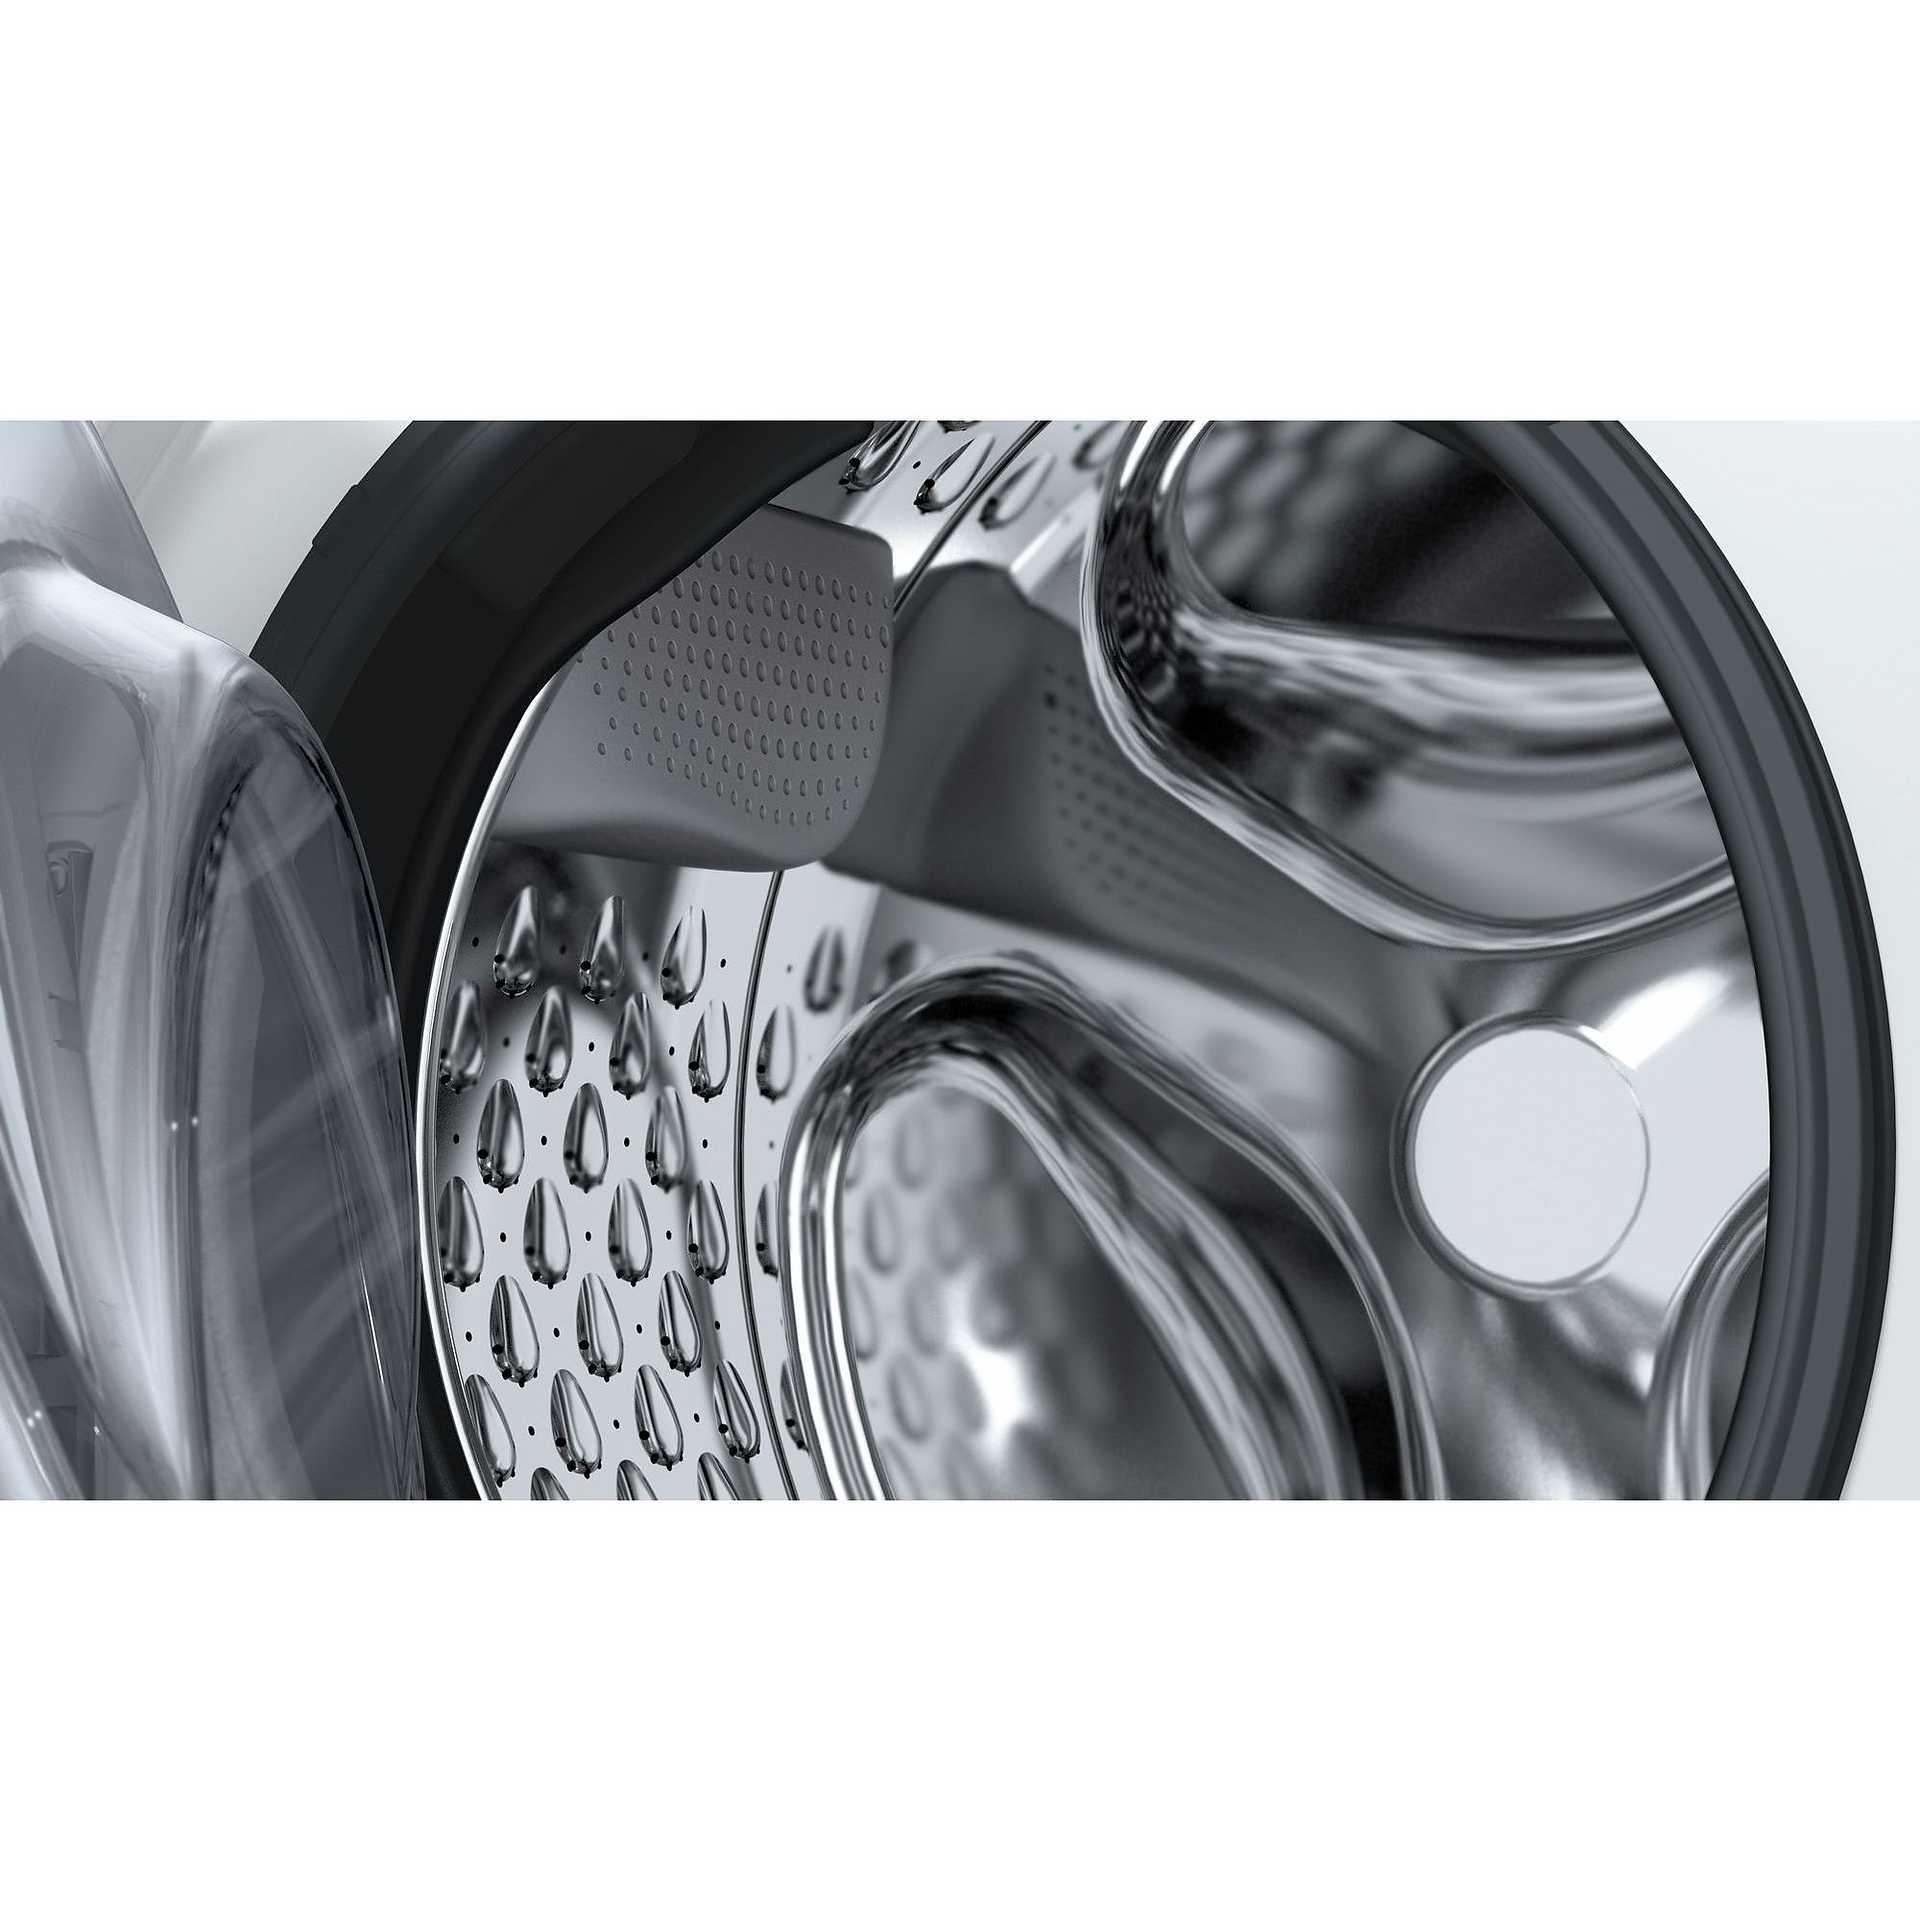 Bosch WLT24427IT lavatrice 45 cm carica frontale 6,5 Kg 1200